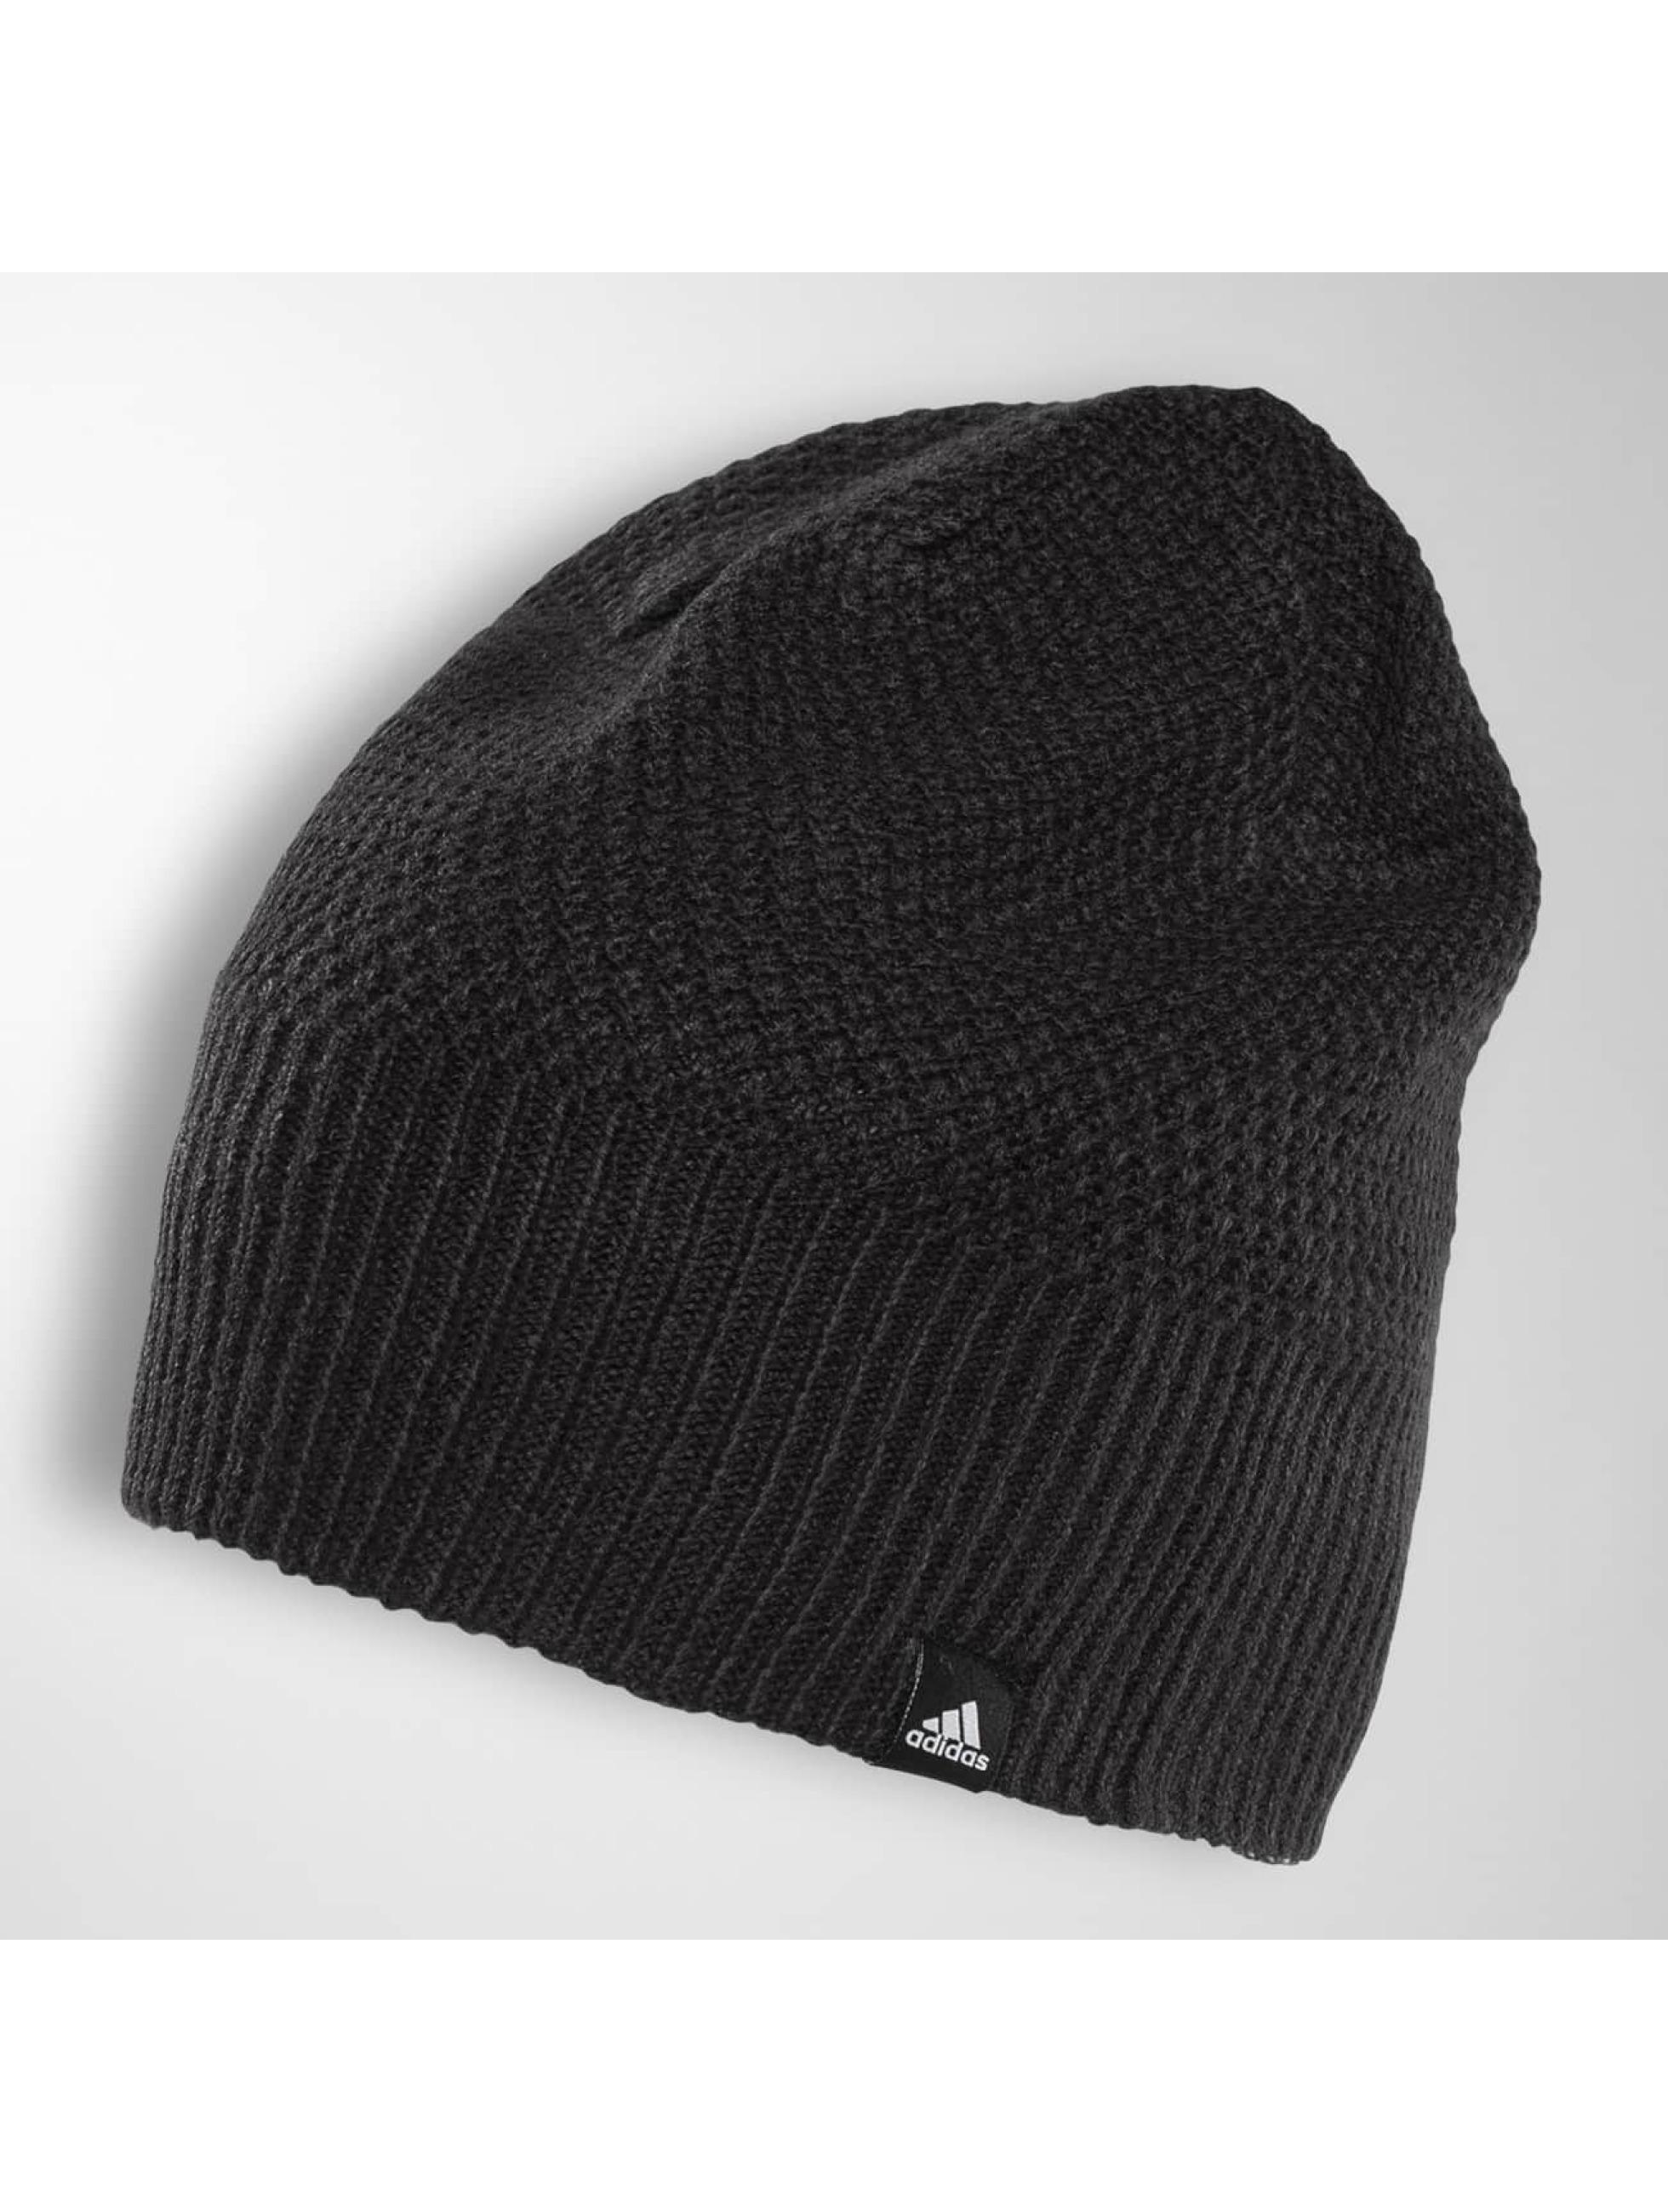 adidas Hat-1 Reversible Classic black